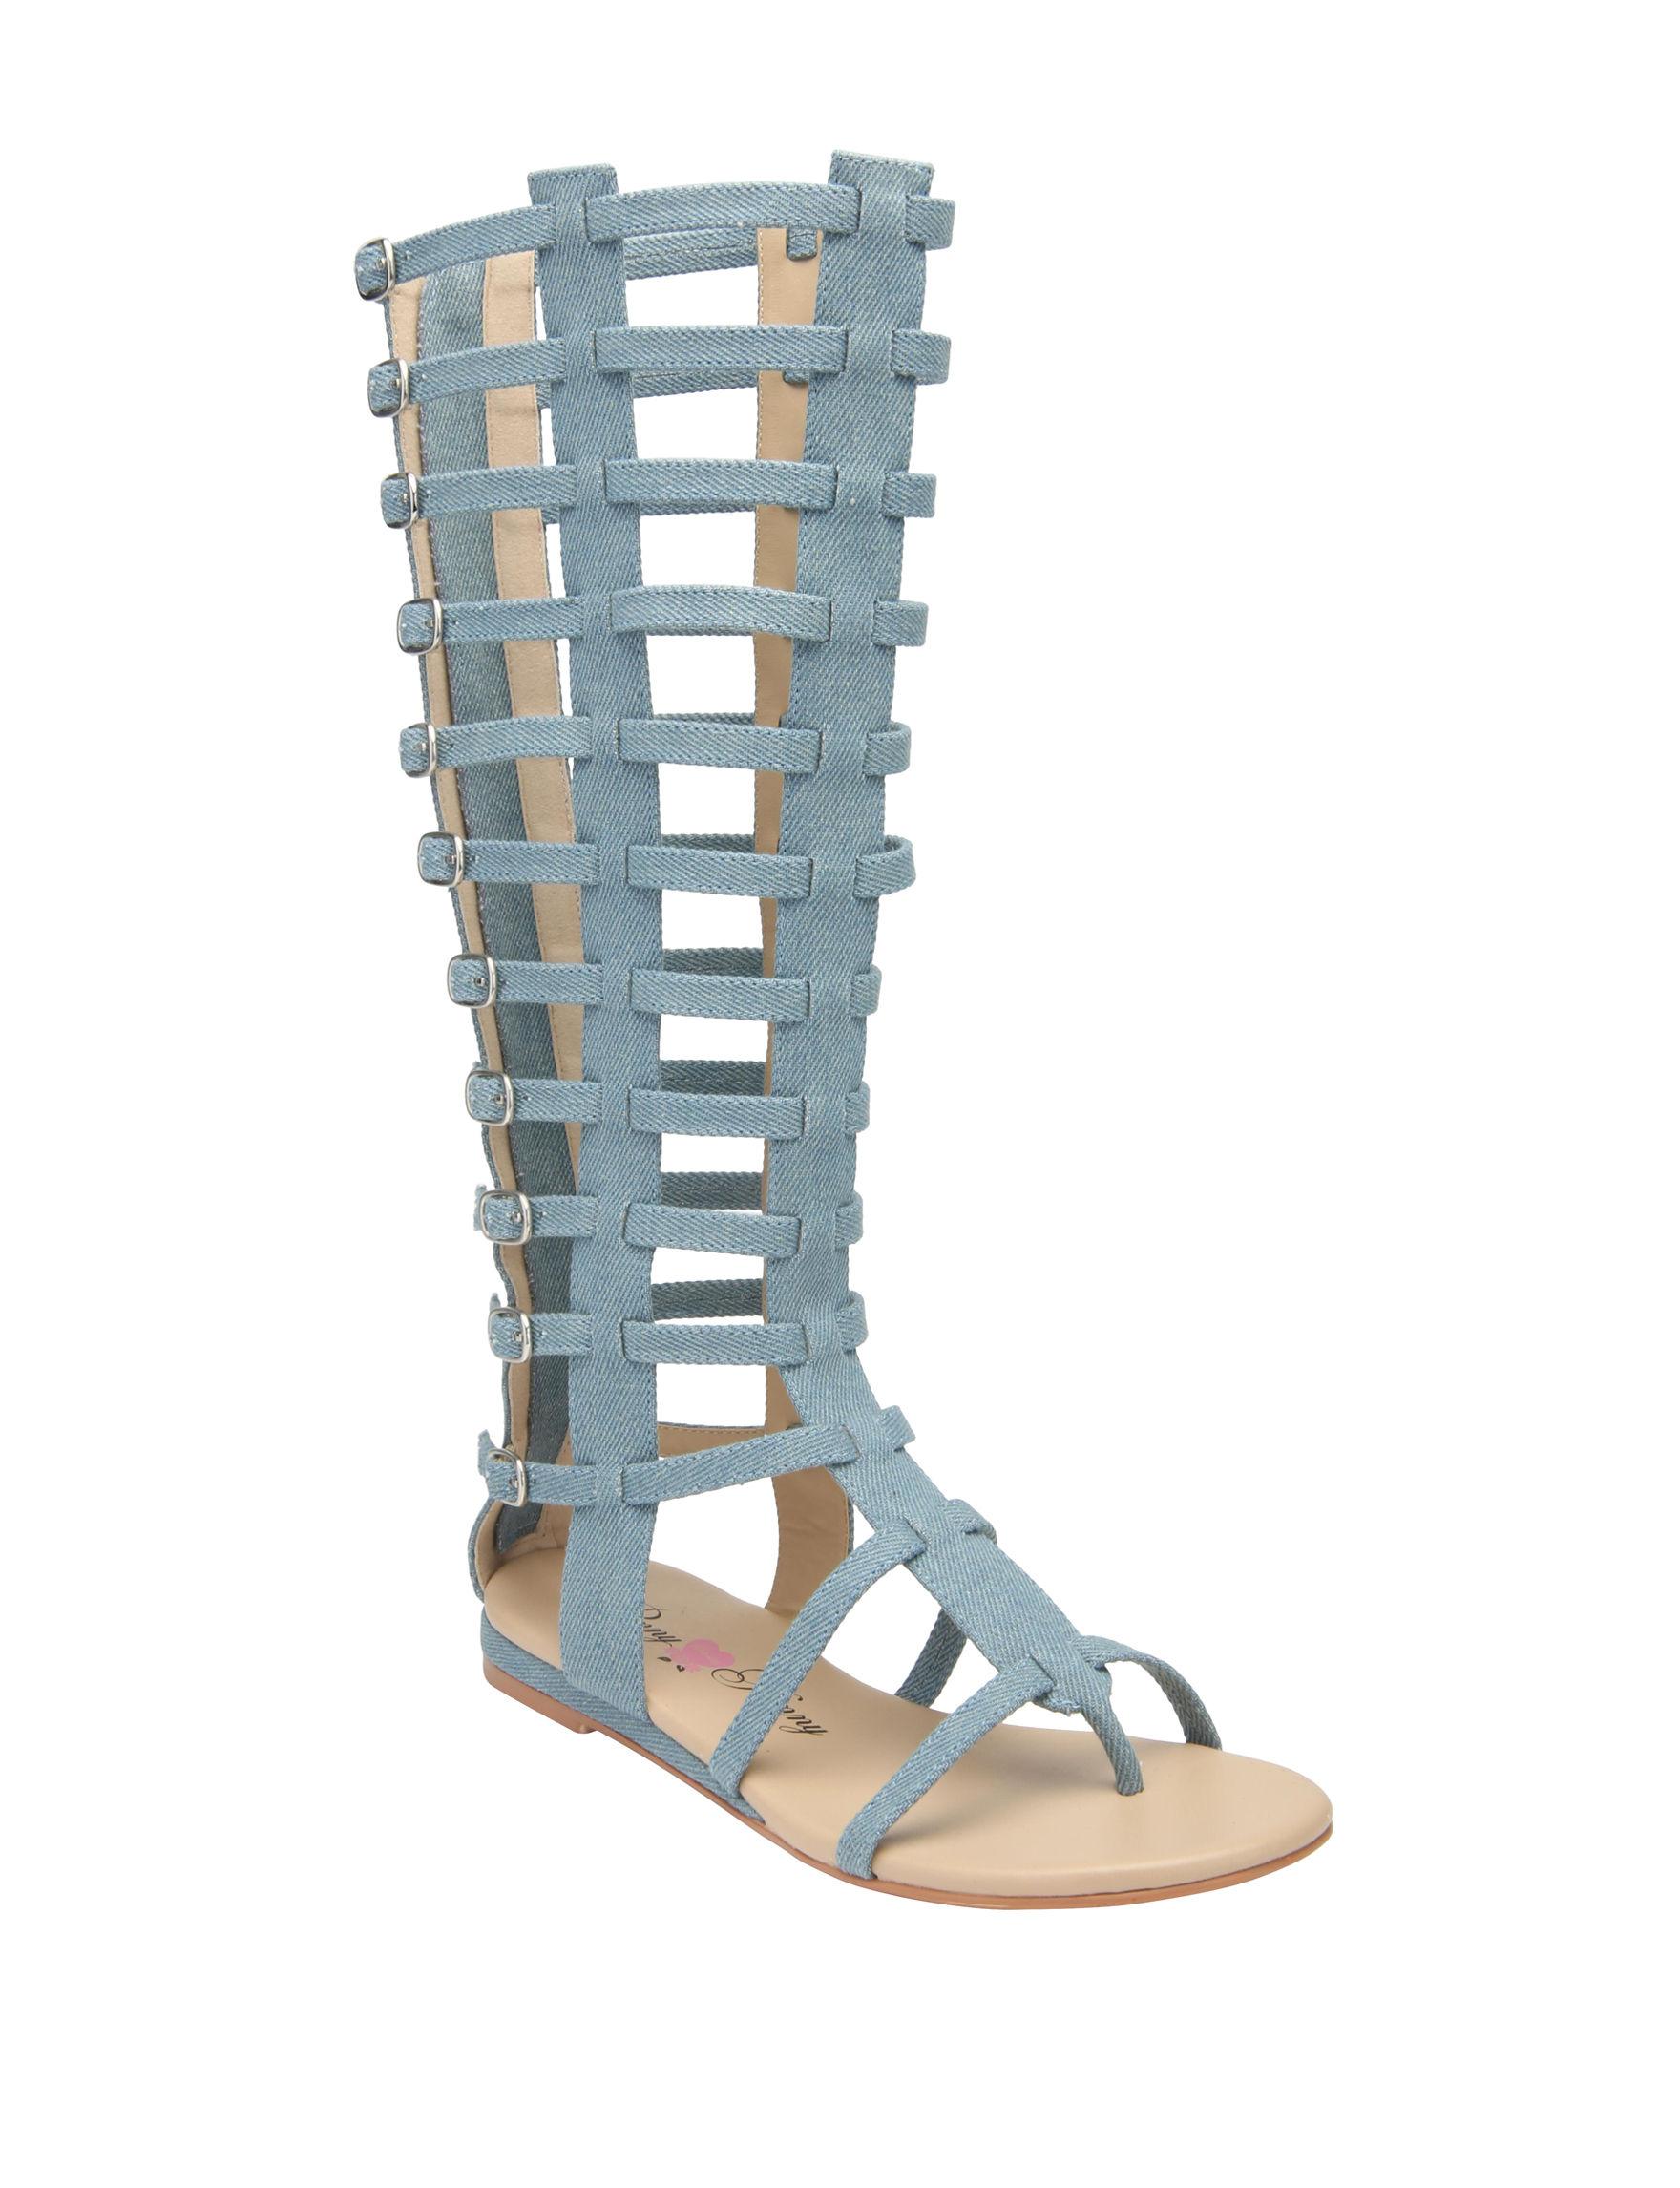 Penny Loves Kenny Blue Flat Sandals Gladiators